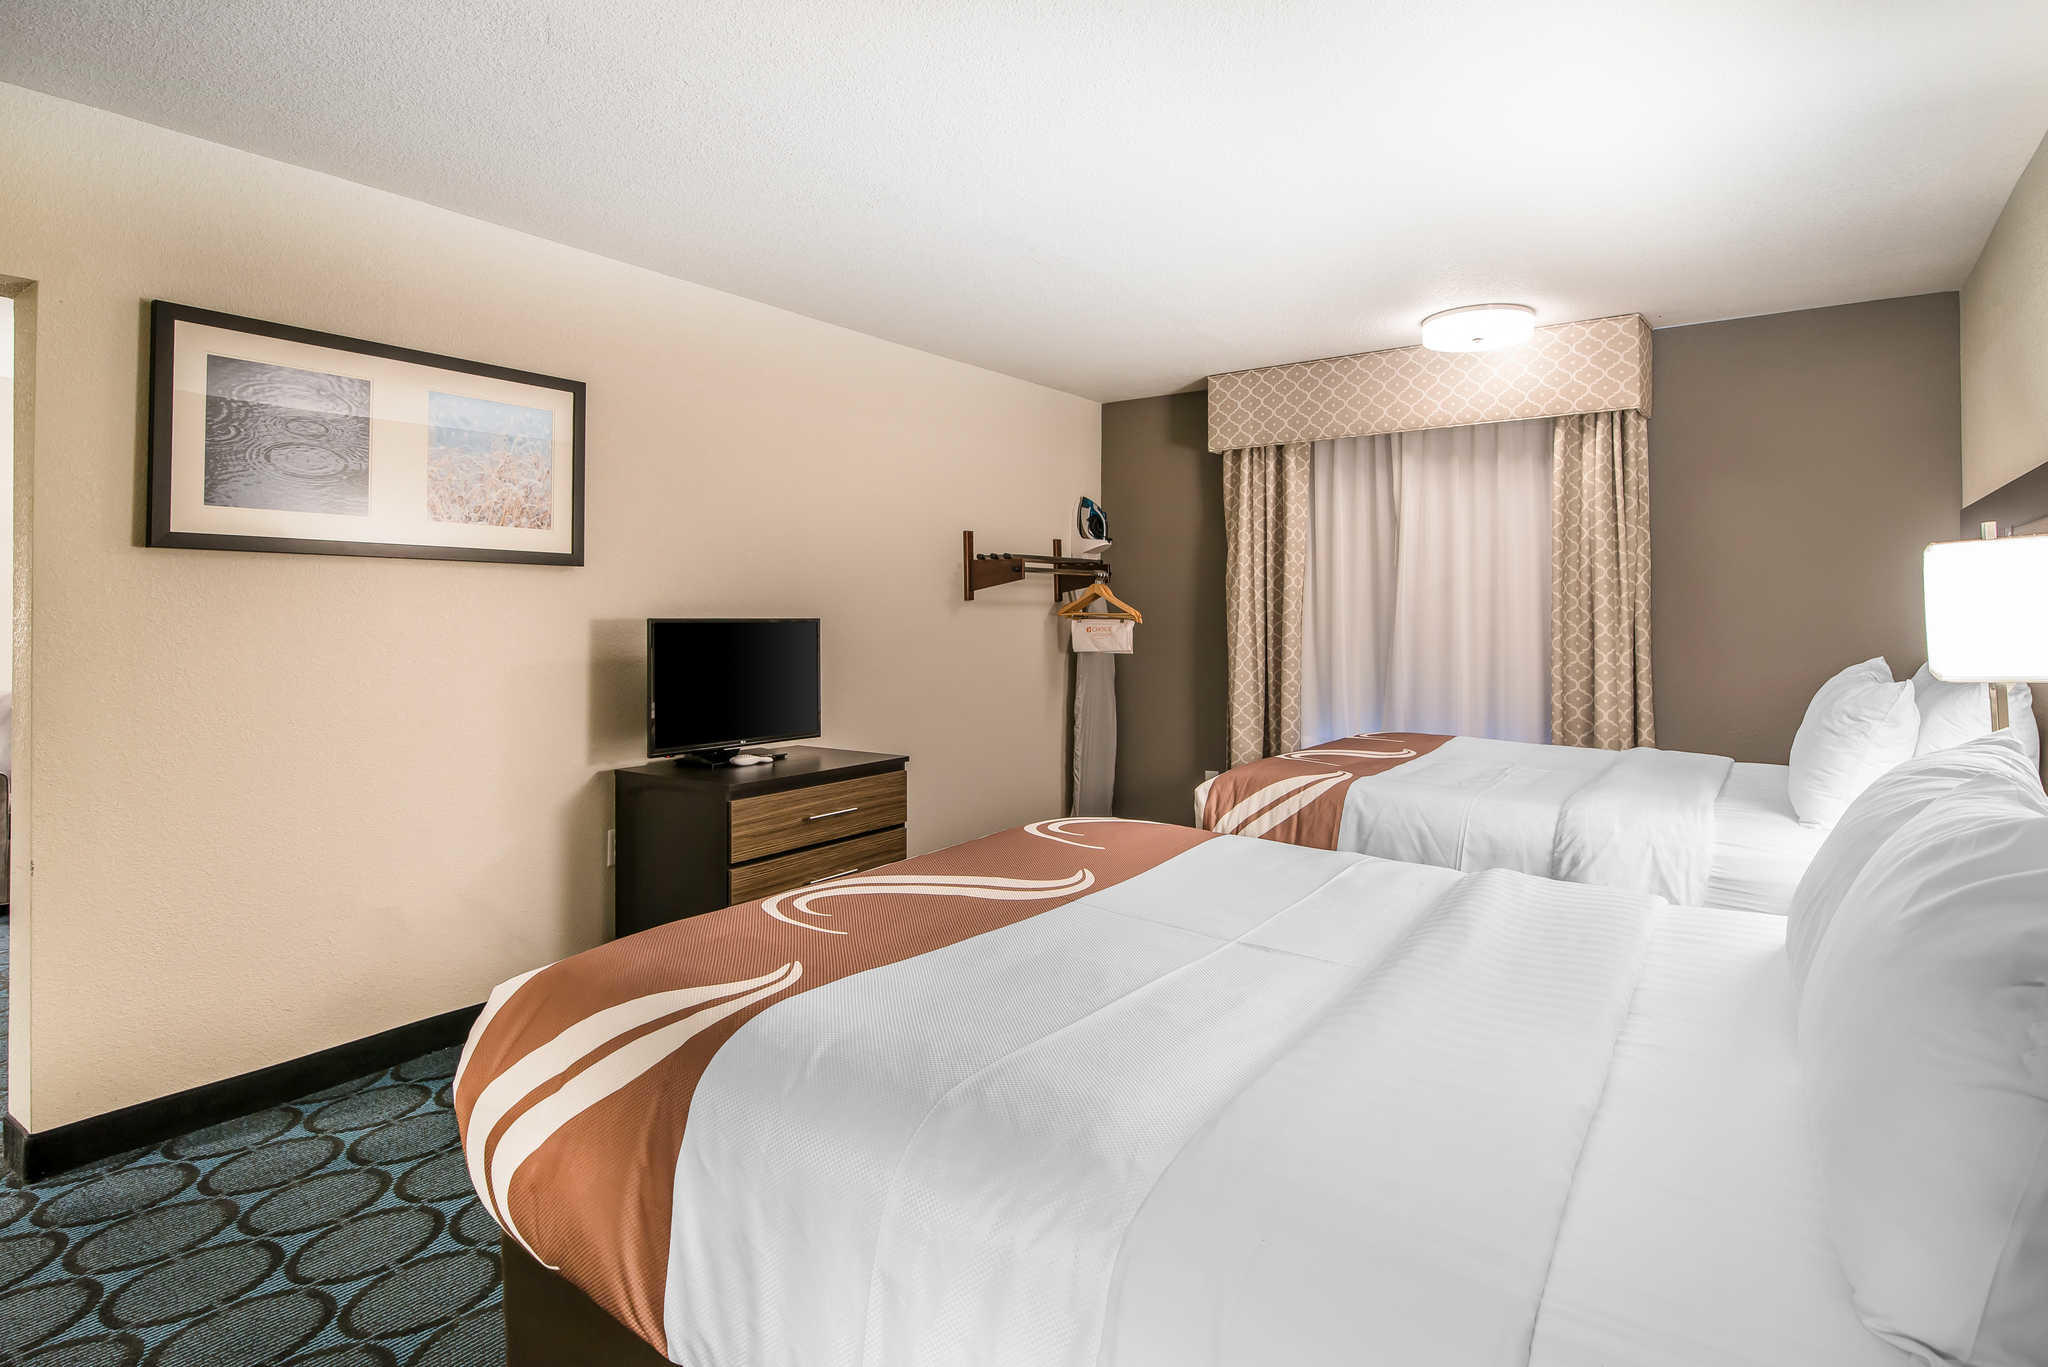 Quality Inn & Suites - Ruidoso Hwy 70 image 14